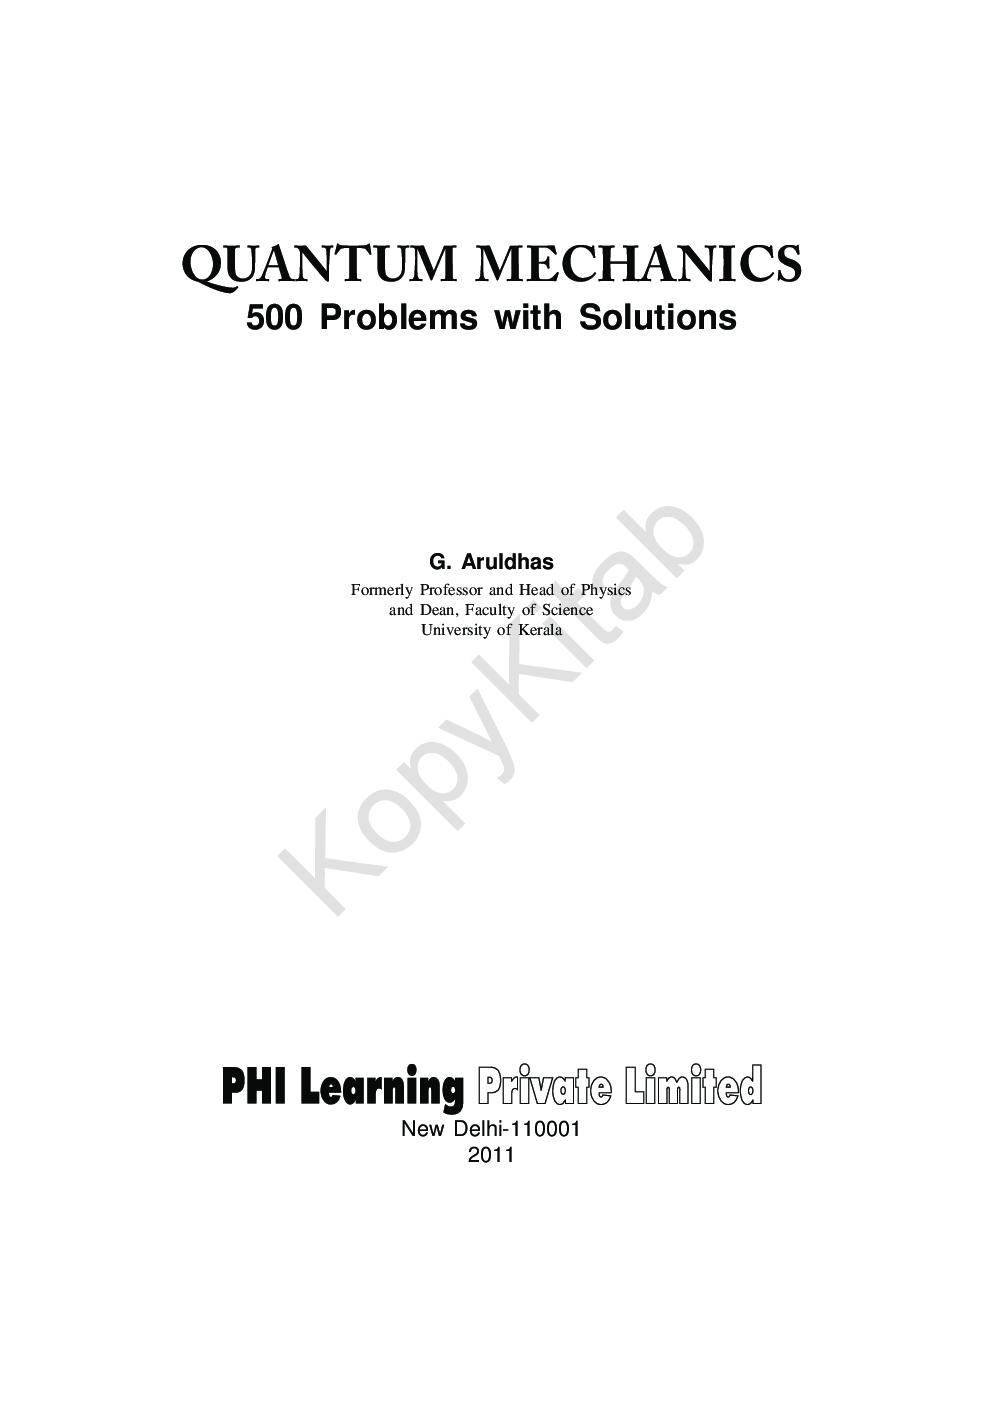 QUANTUM MECHANICS 500 PROBLEMS WITH SOLUTIONS ARULDHAS PDF